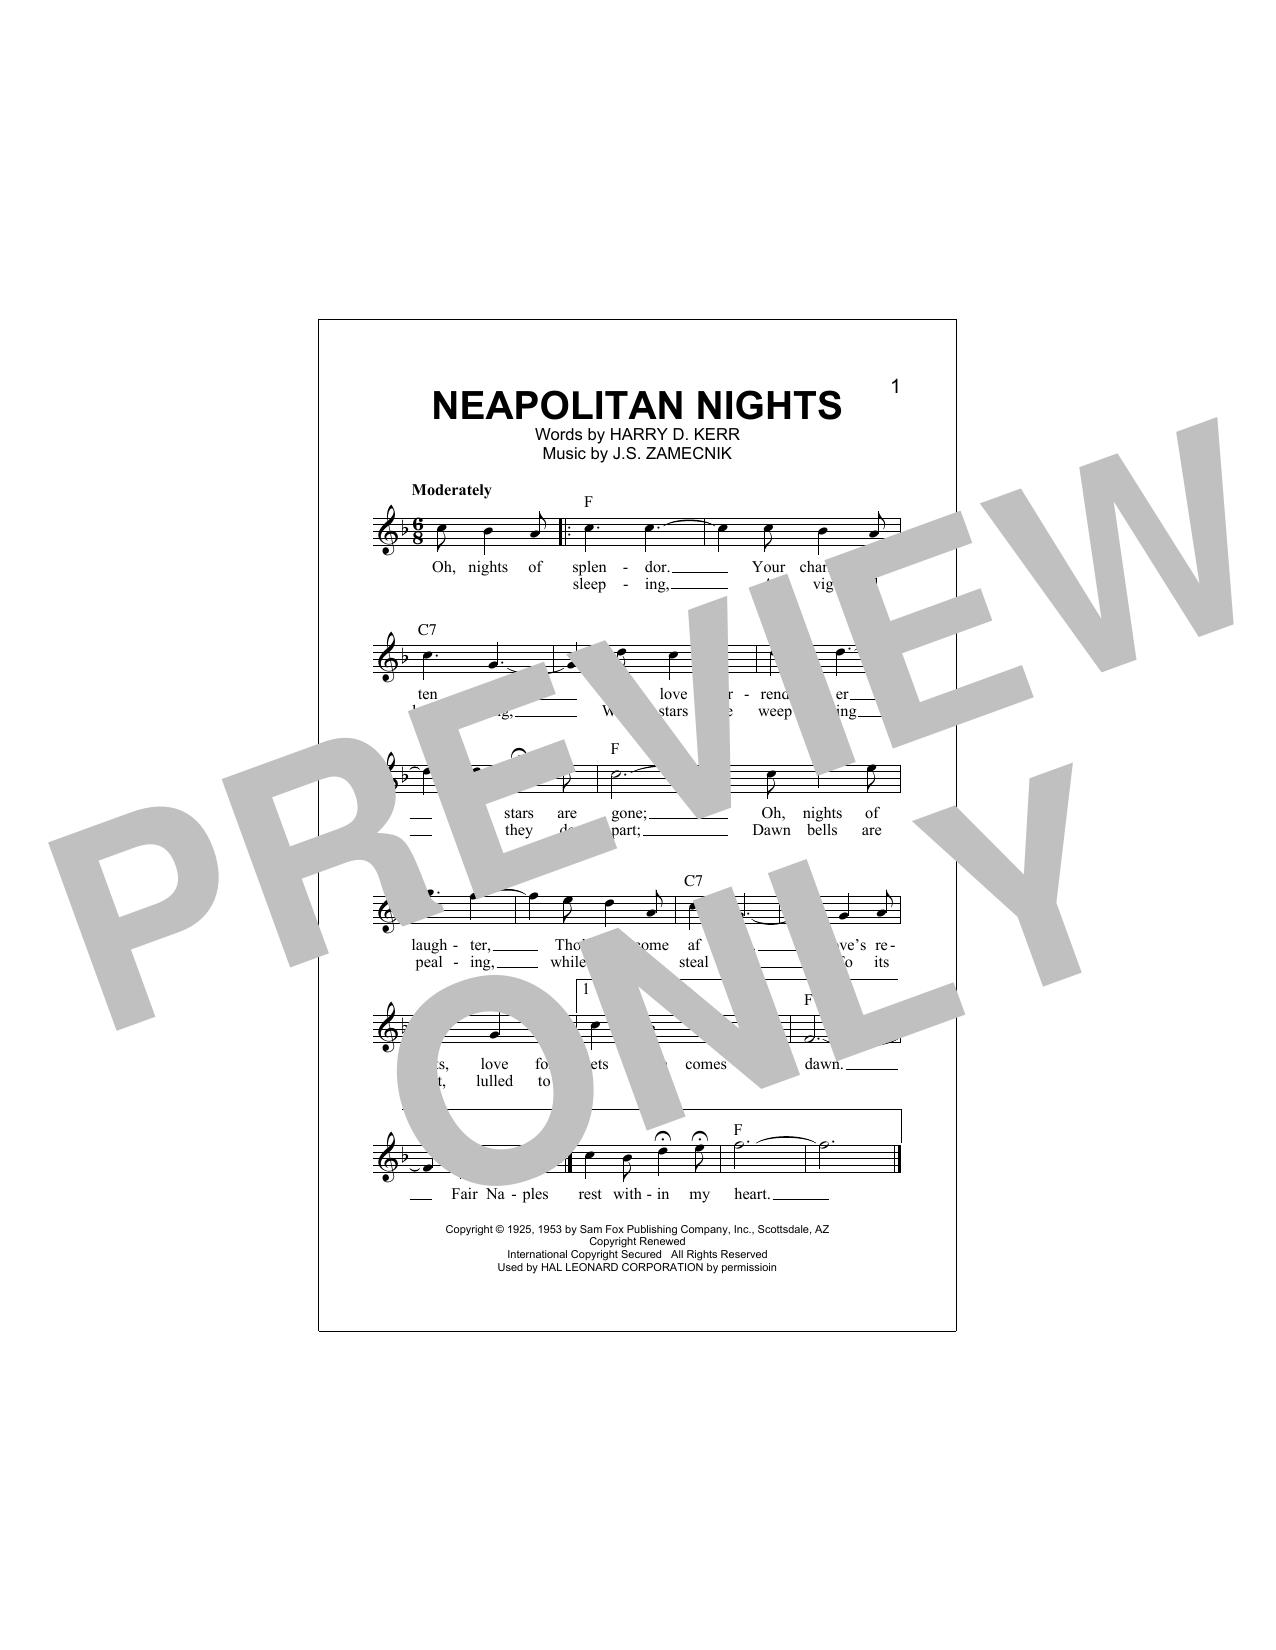 Neapolitan Nights Sheet Music